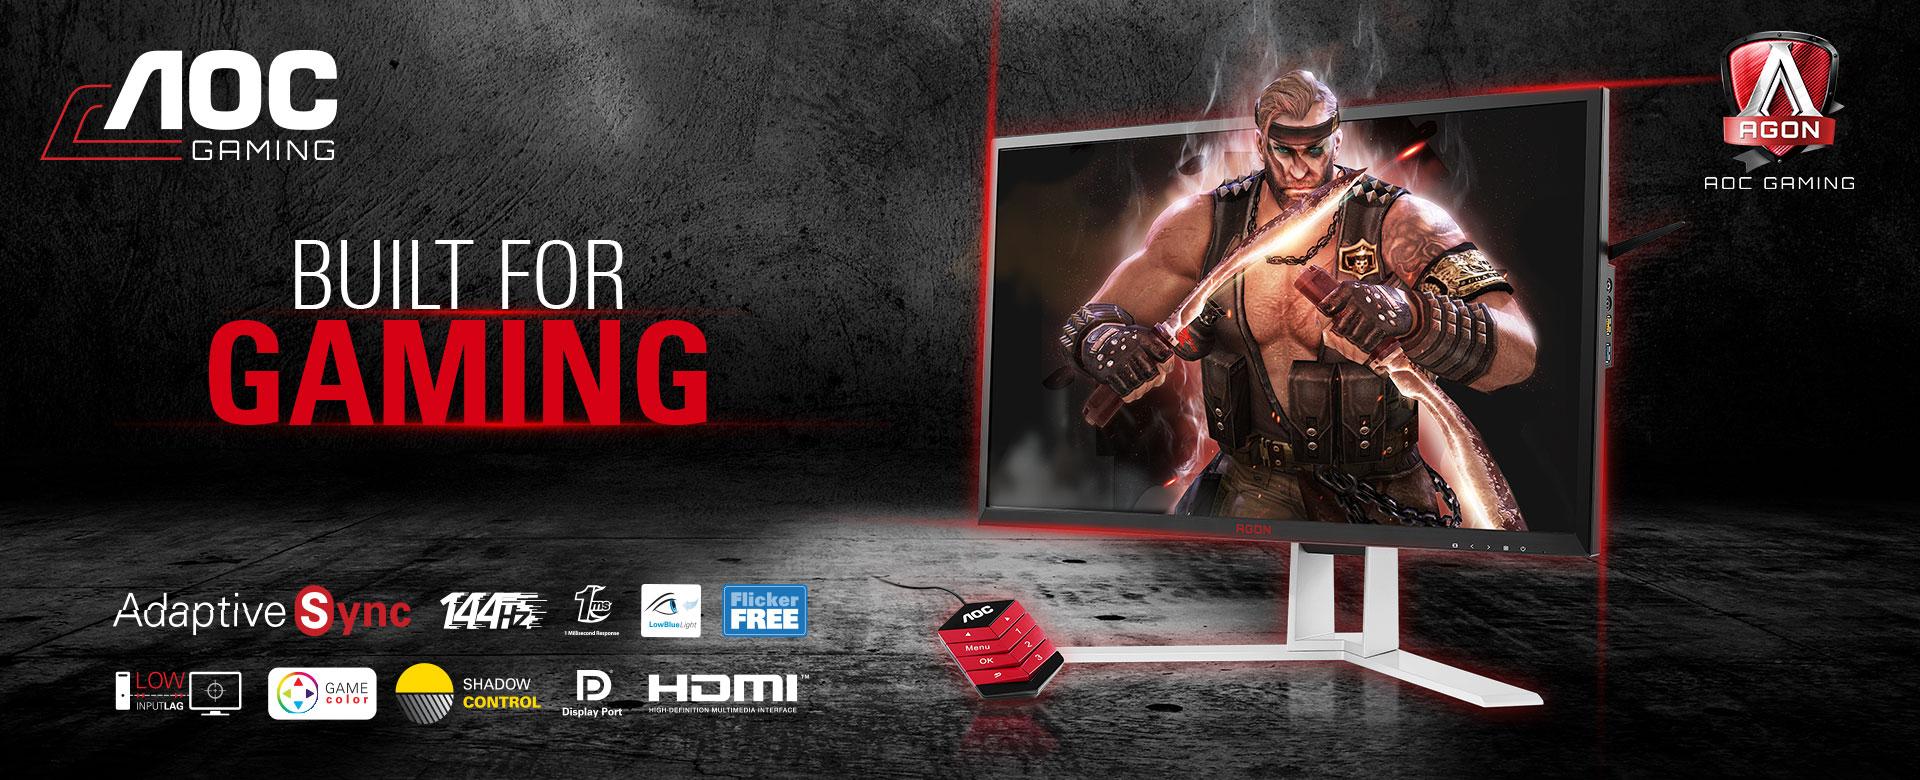 Aoc tienda online , monitor aoc gaming , comprar monitor aoc , tienda aoc , monitor gaming barato